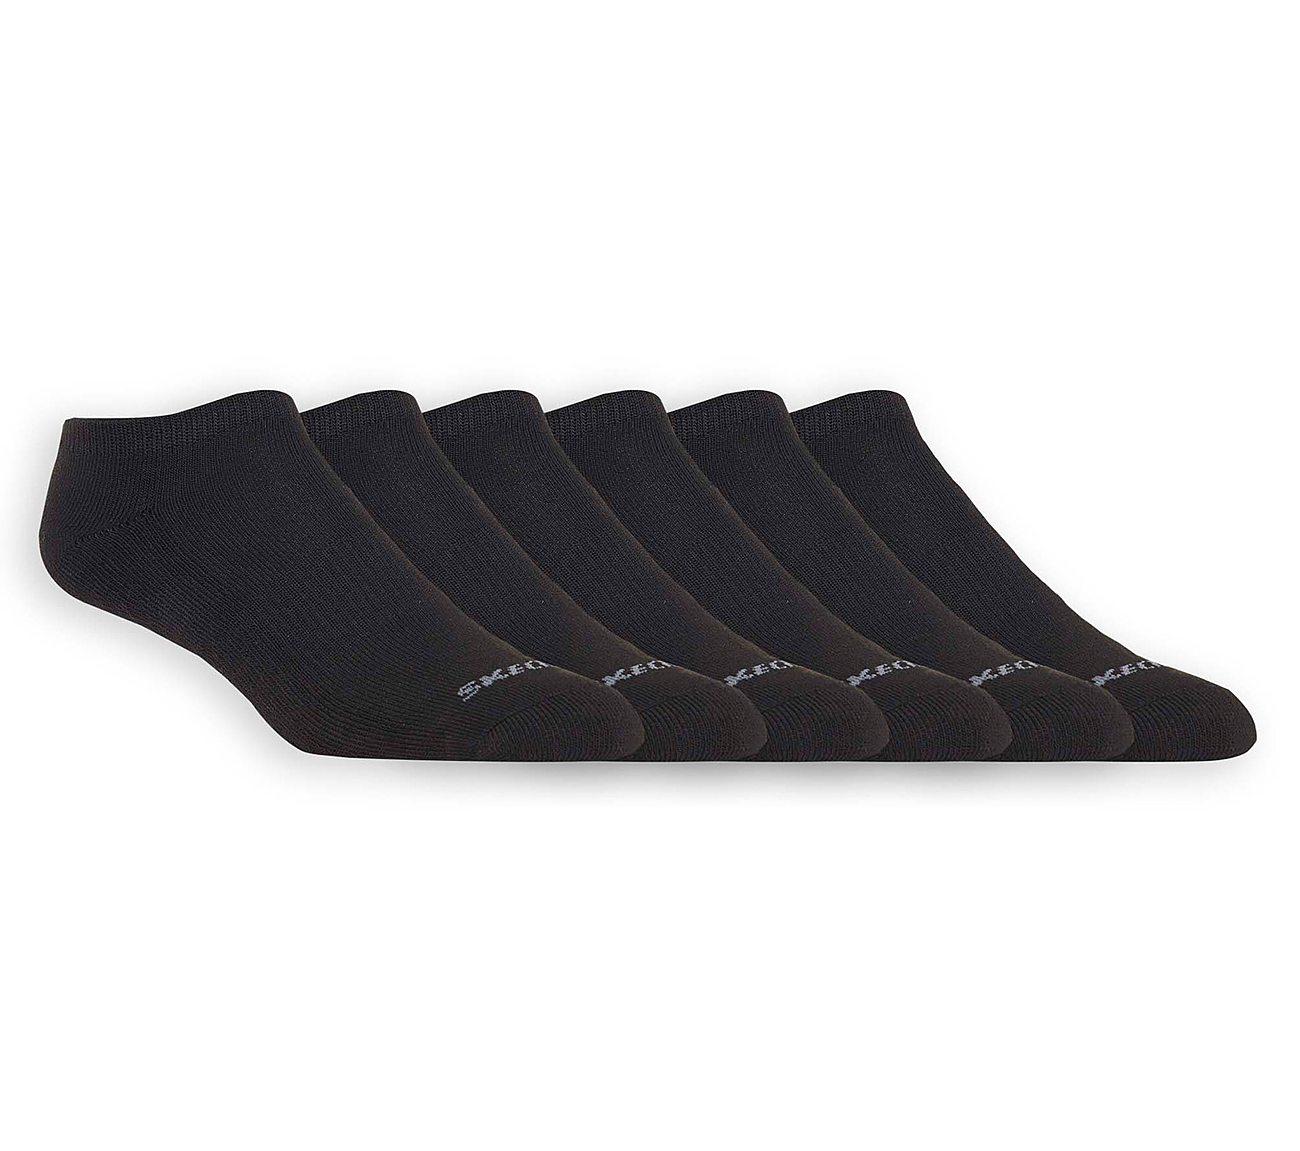 6 Pack Half Terry Low Cut Socks